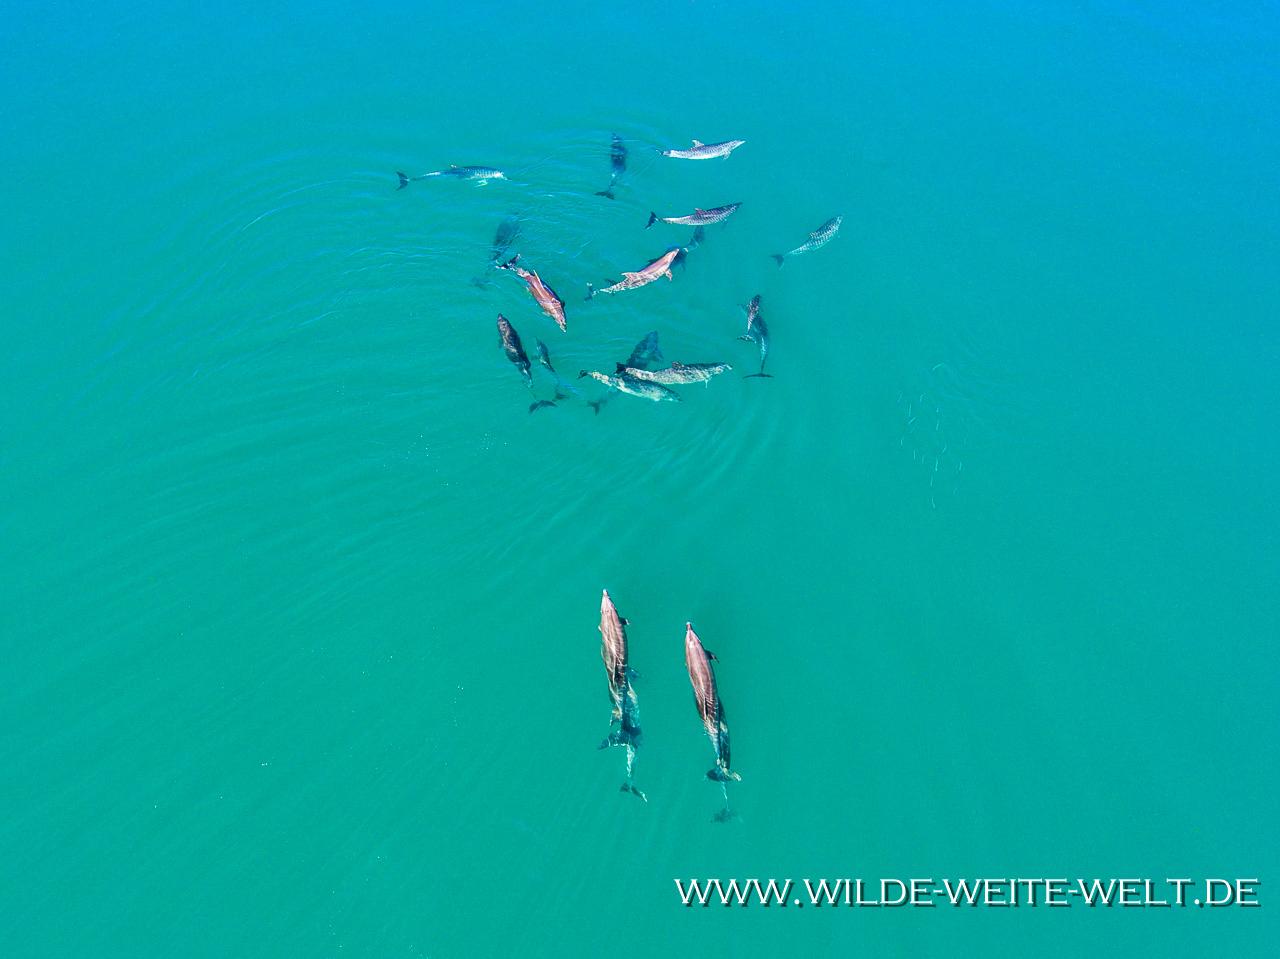 Dolphins-Punta-Prieta-Mulegé-Baja-California-Süd-19 Delfine / Dolphins Punta Prieta bei Mulegé [Mexico / Baja California]